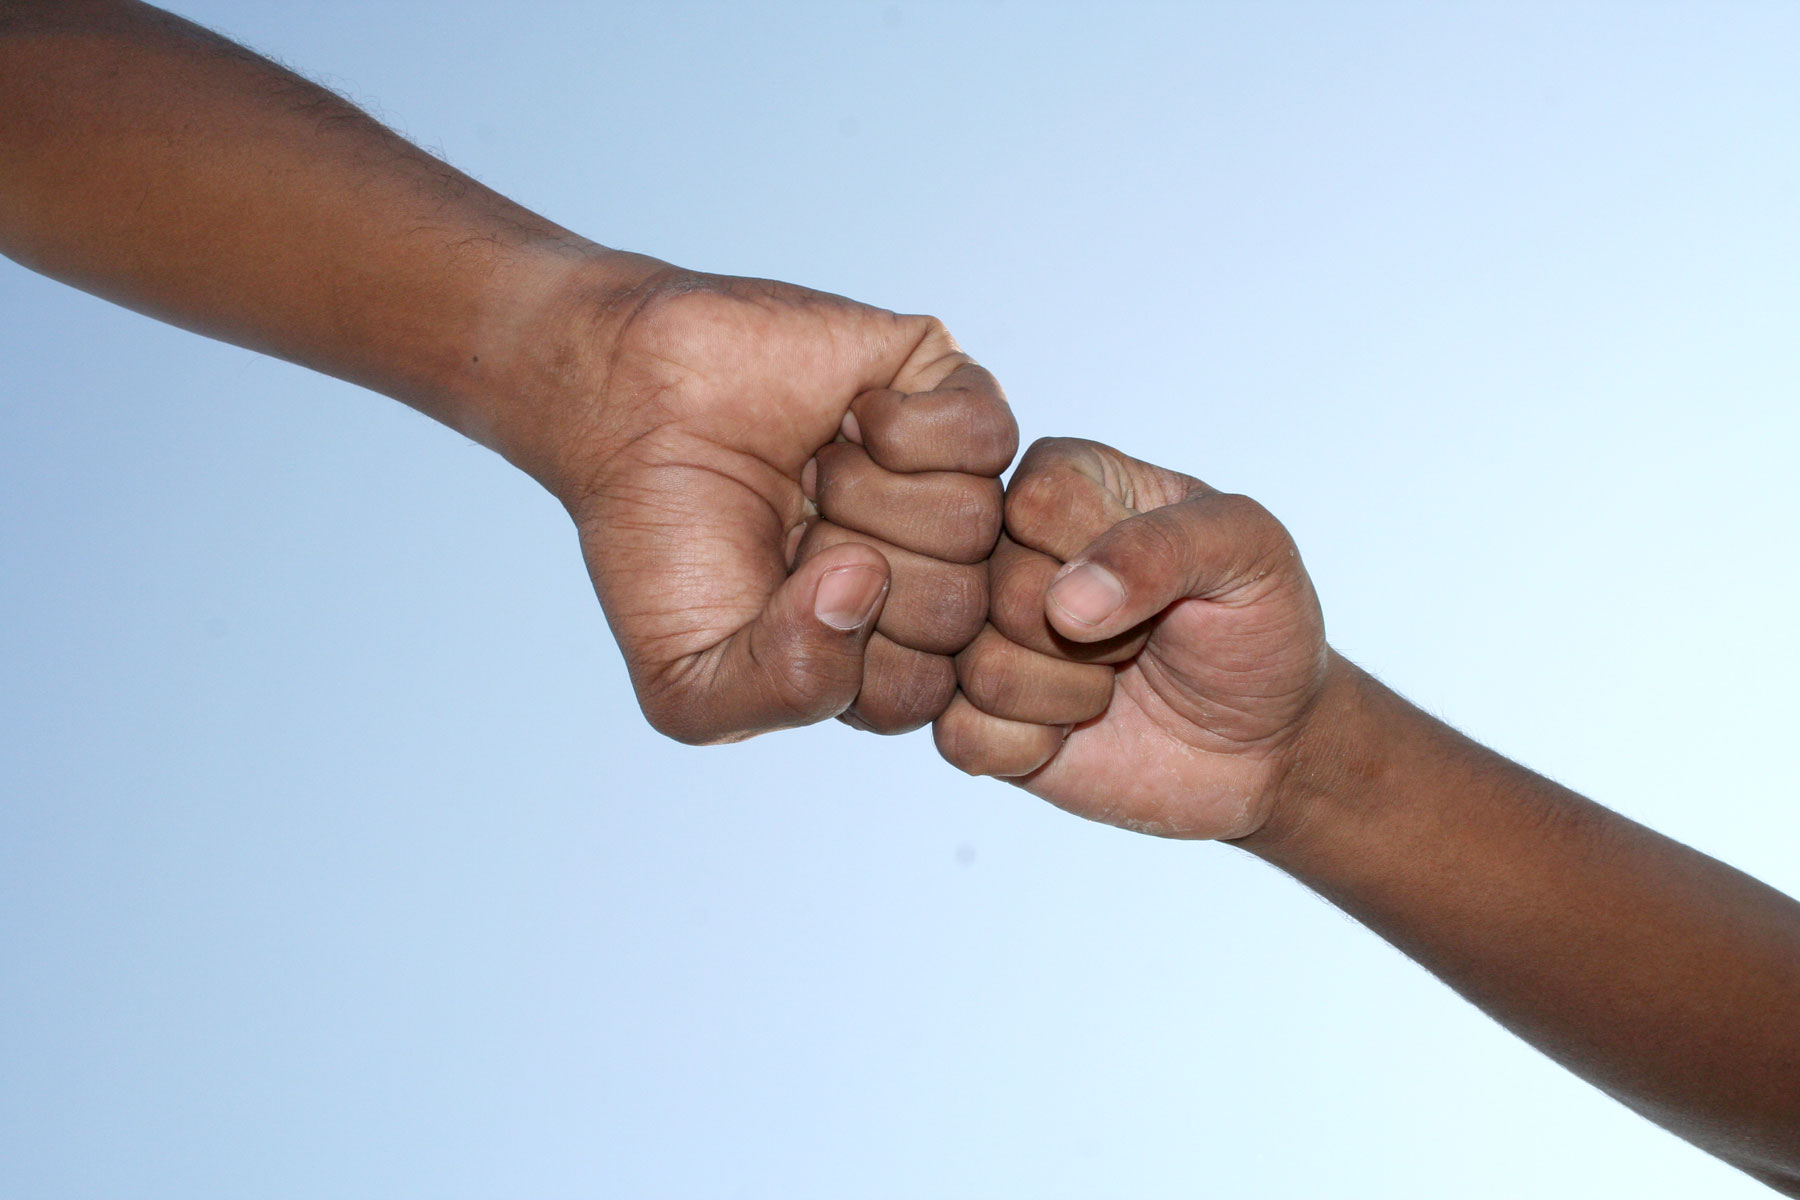 get-start-1578004_fistbump_handshake.jpg